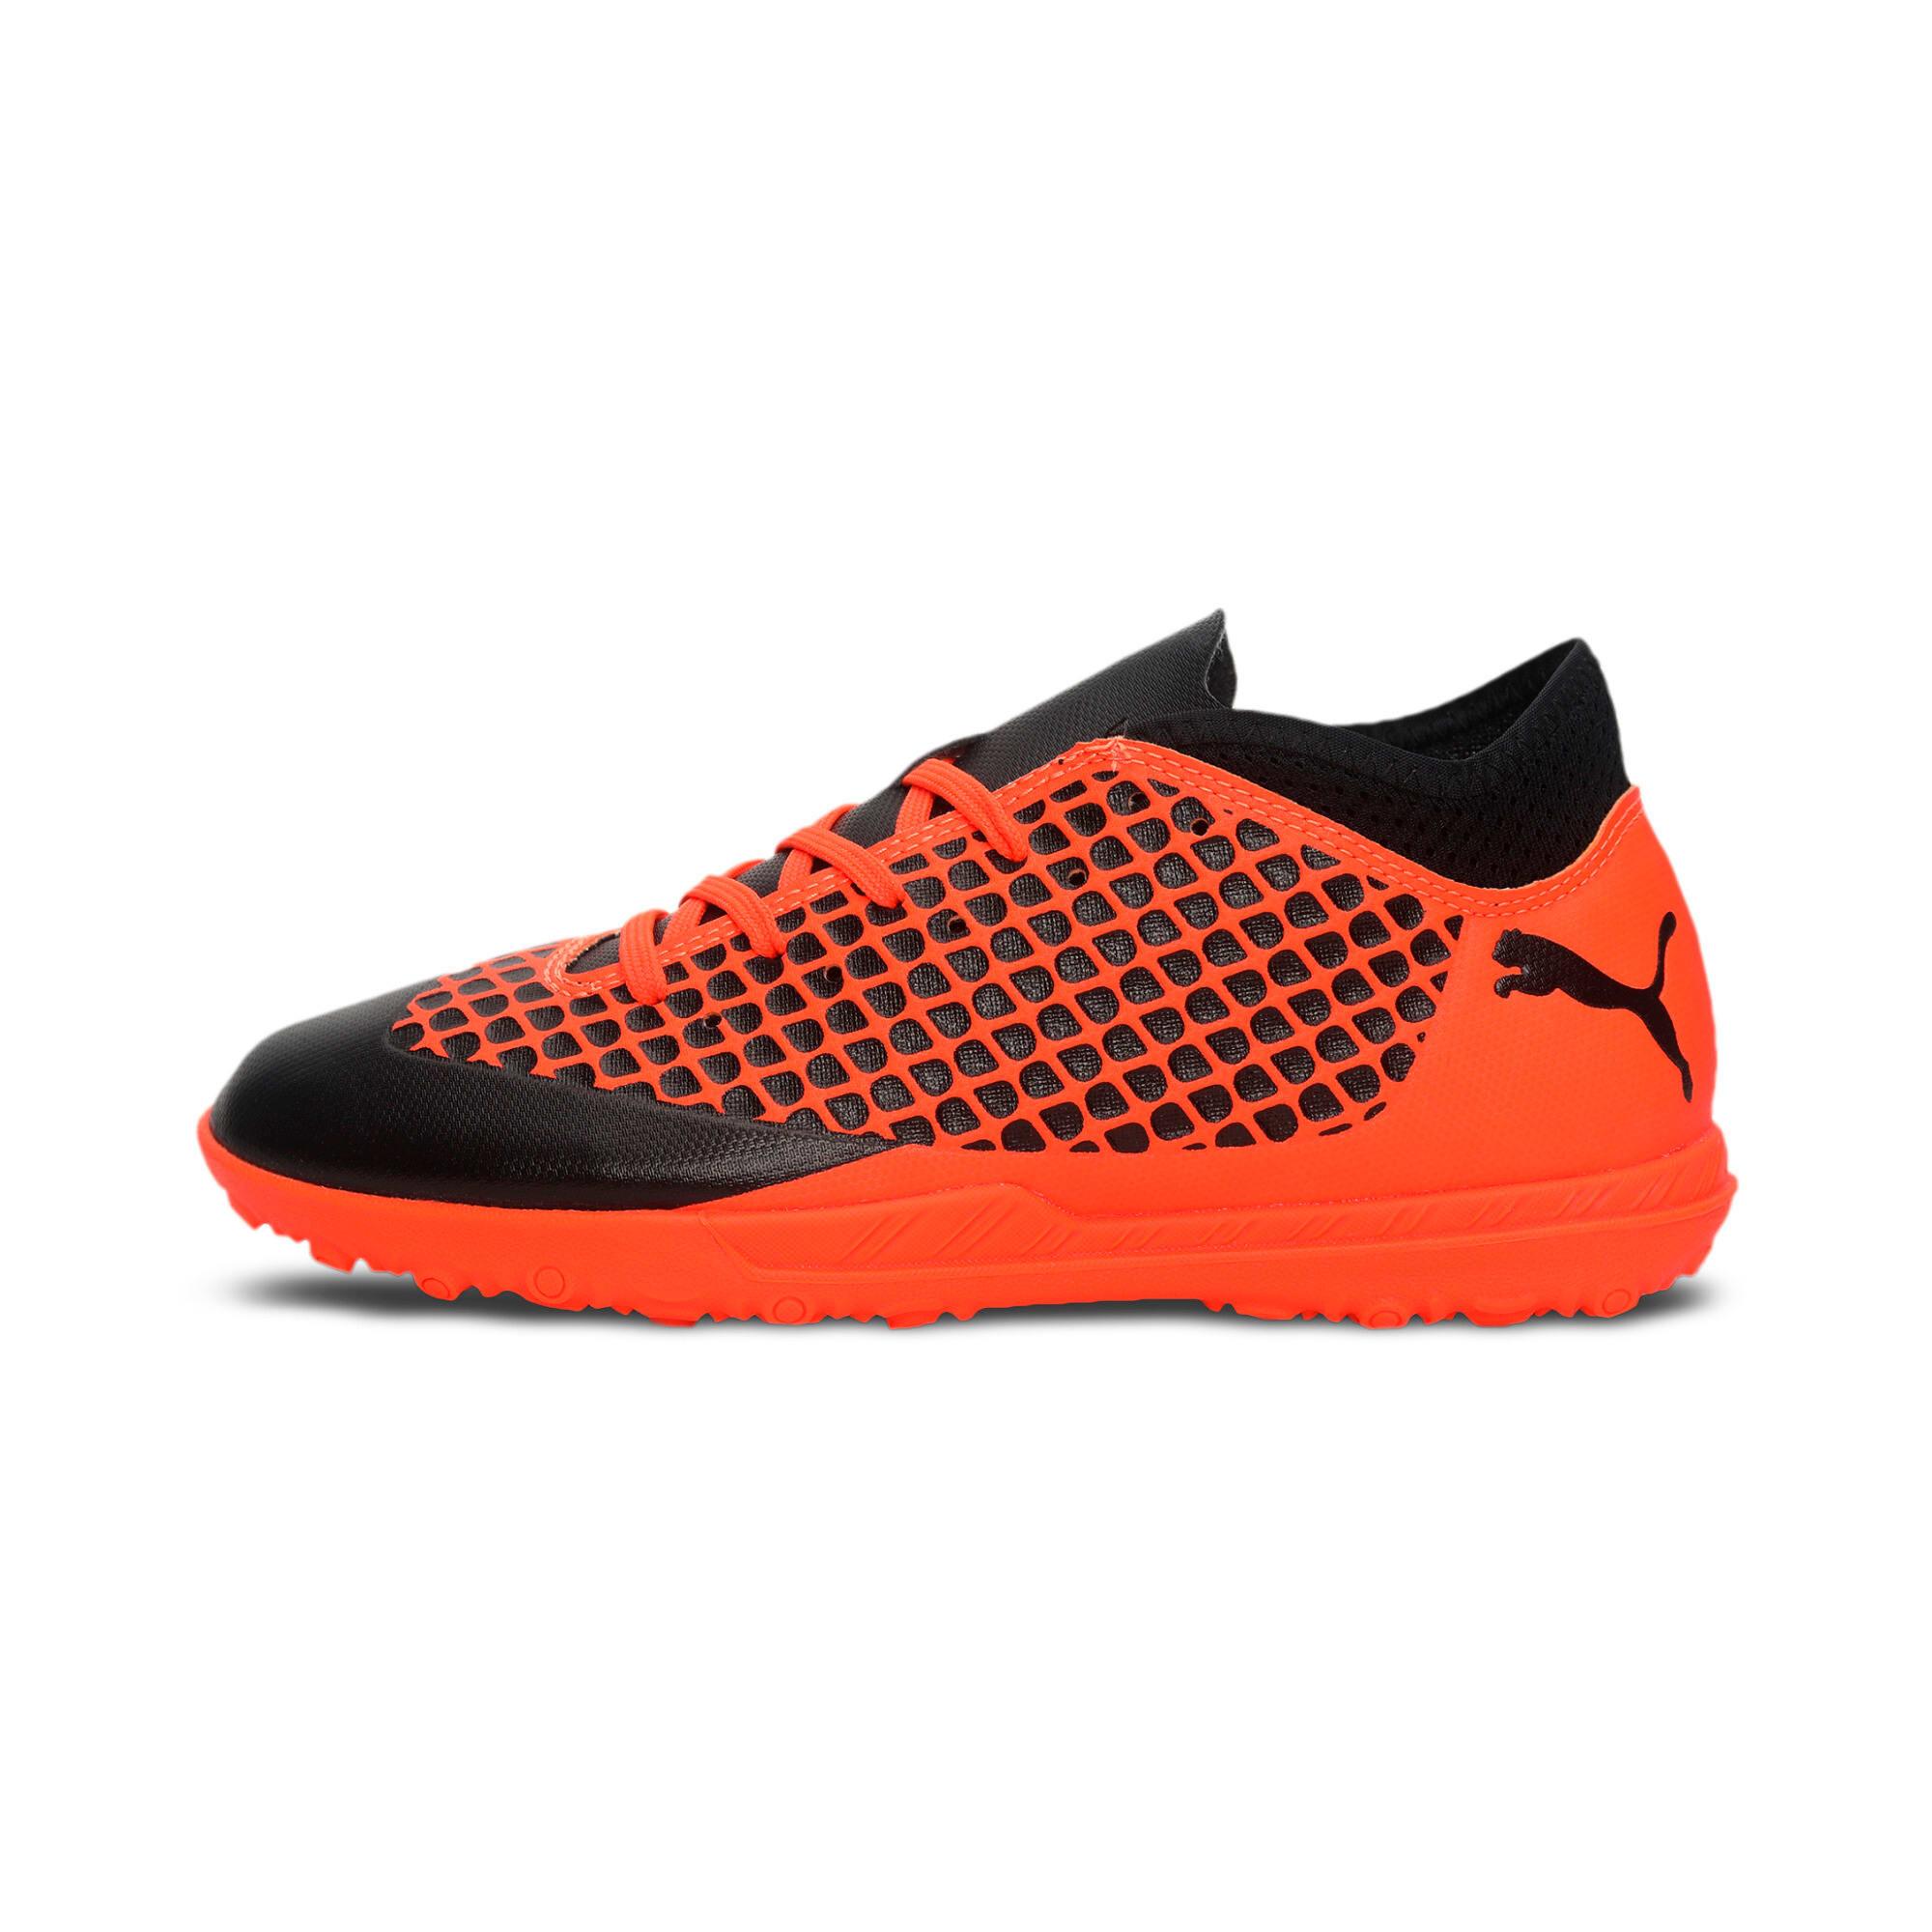 Thumbnail 1 of FUTURE 2.4 TT Kids' Football Boots, Black-Orange, medium-IND